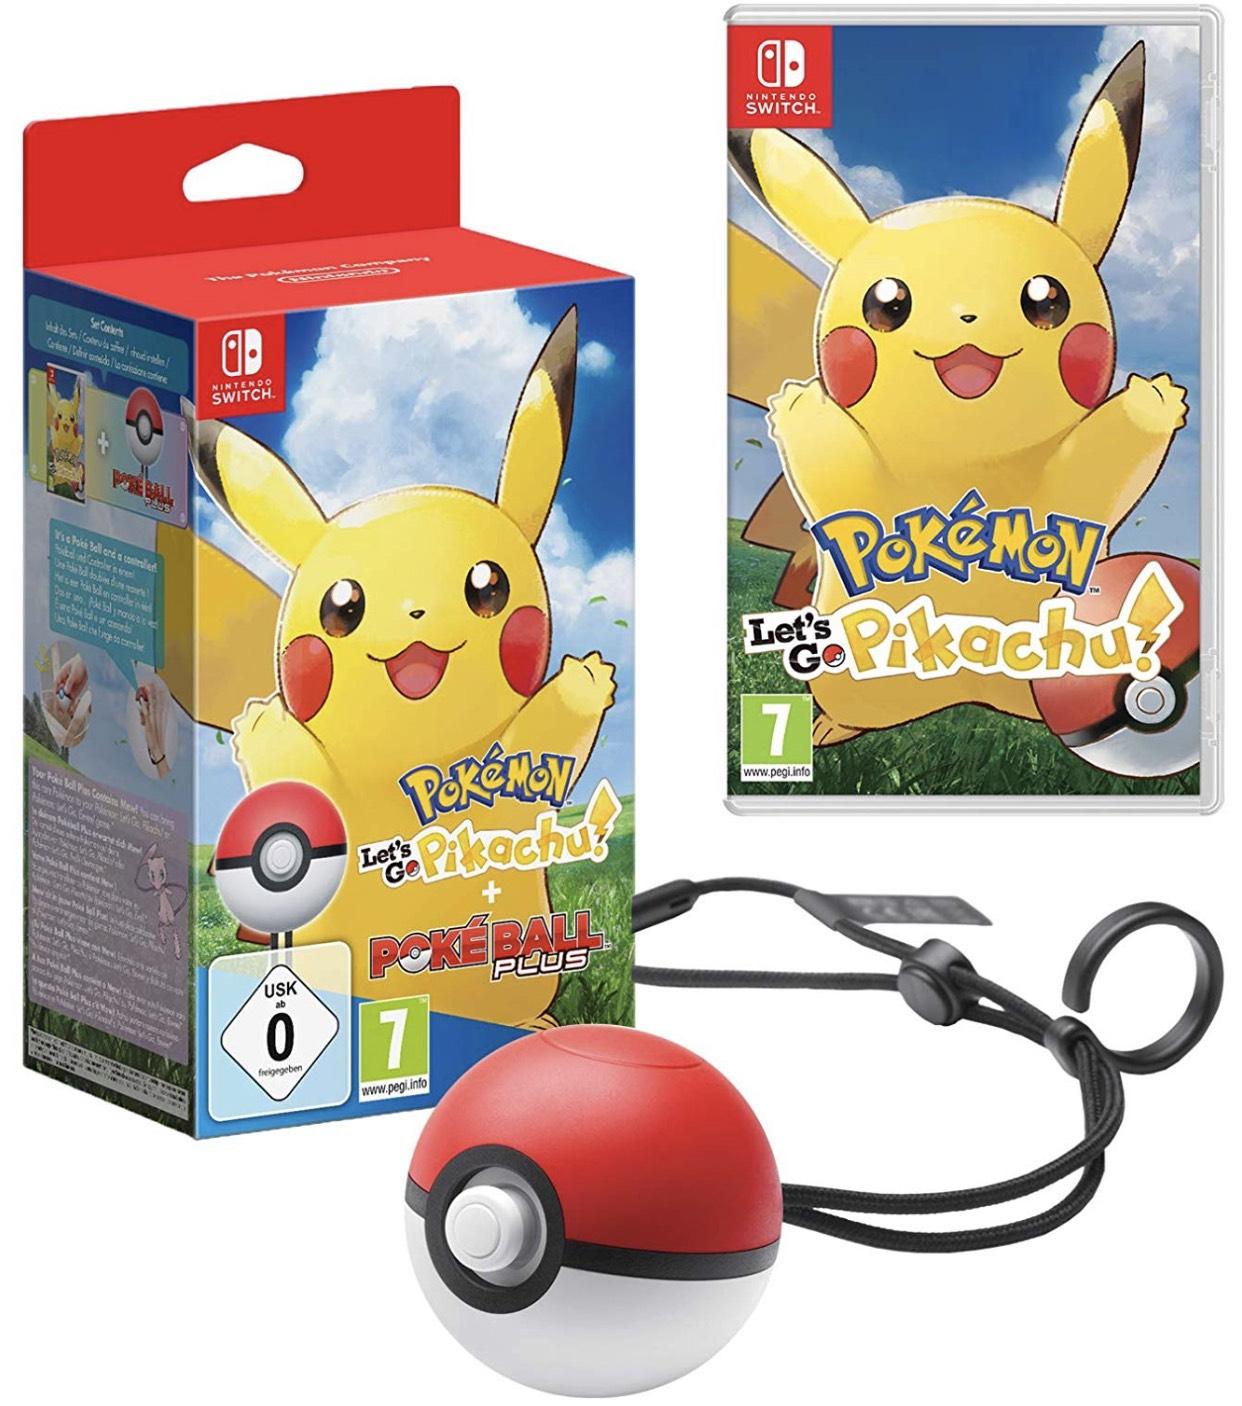 Pokémon: Let's Go, Pikachu! + Pokéball Plus für 47,40€